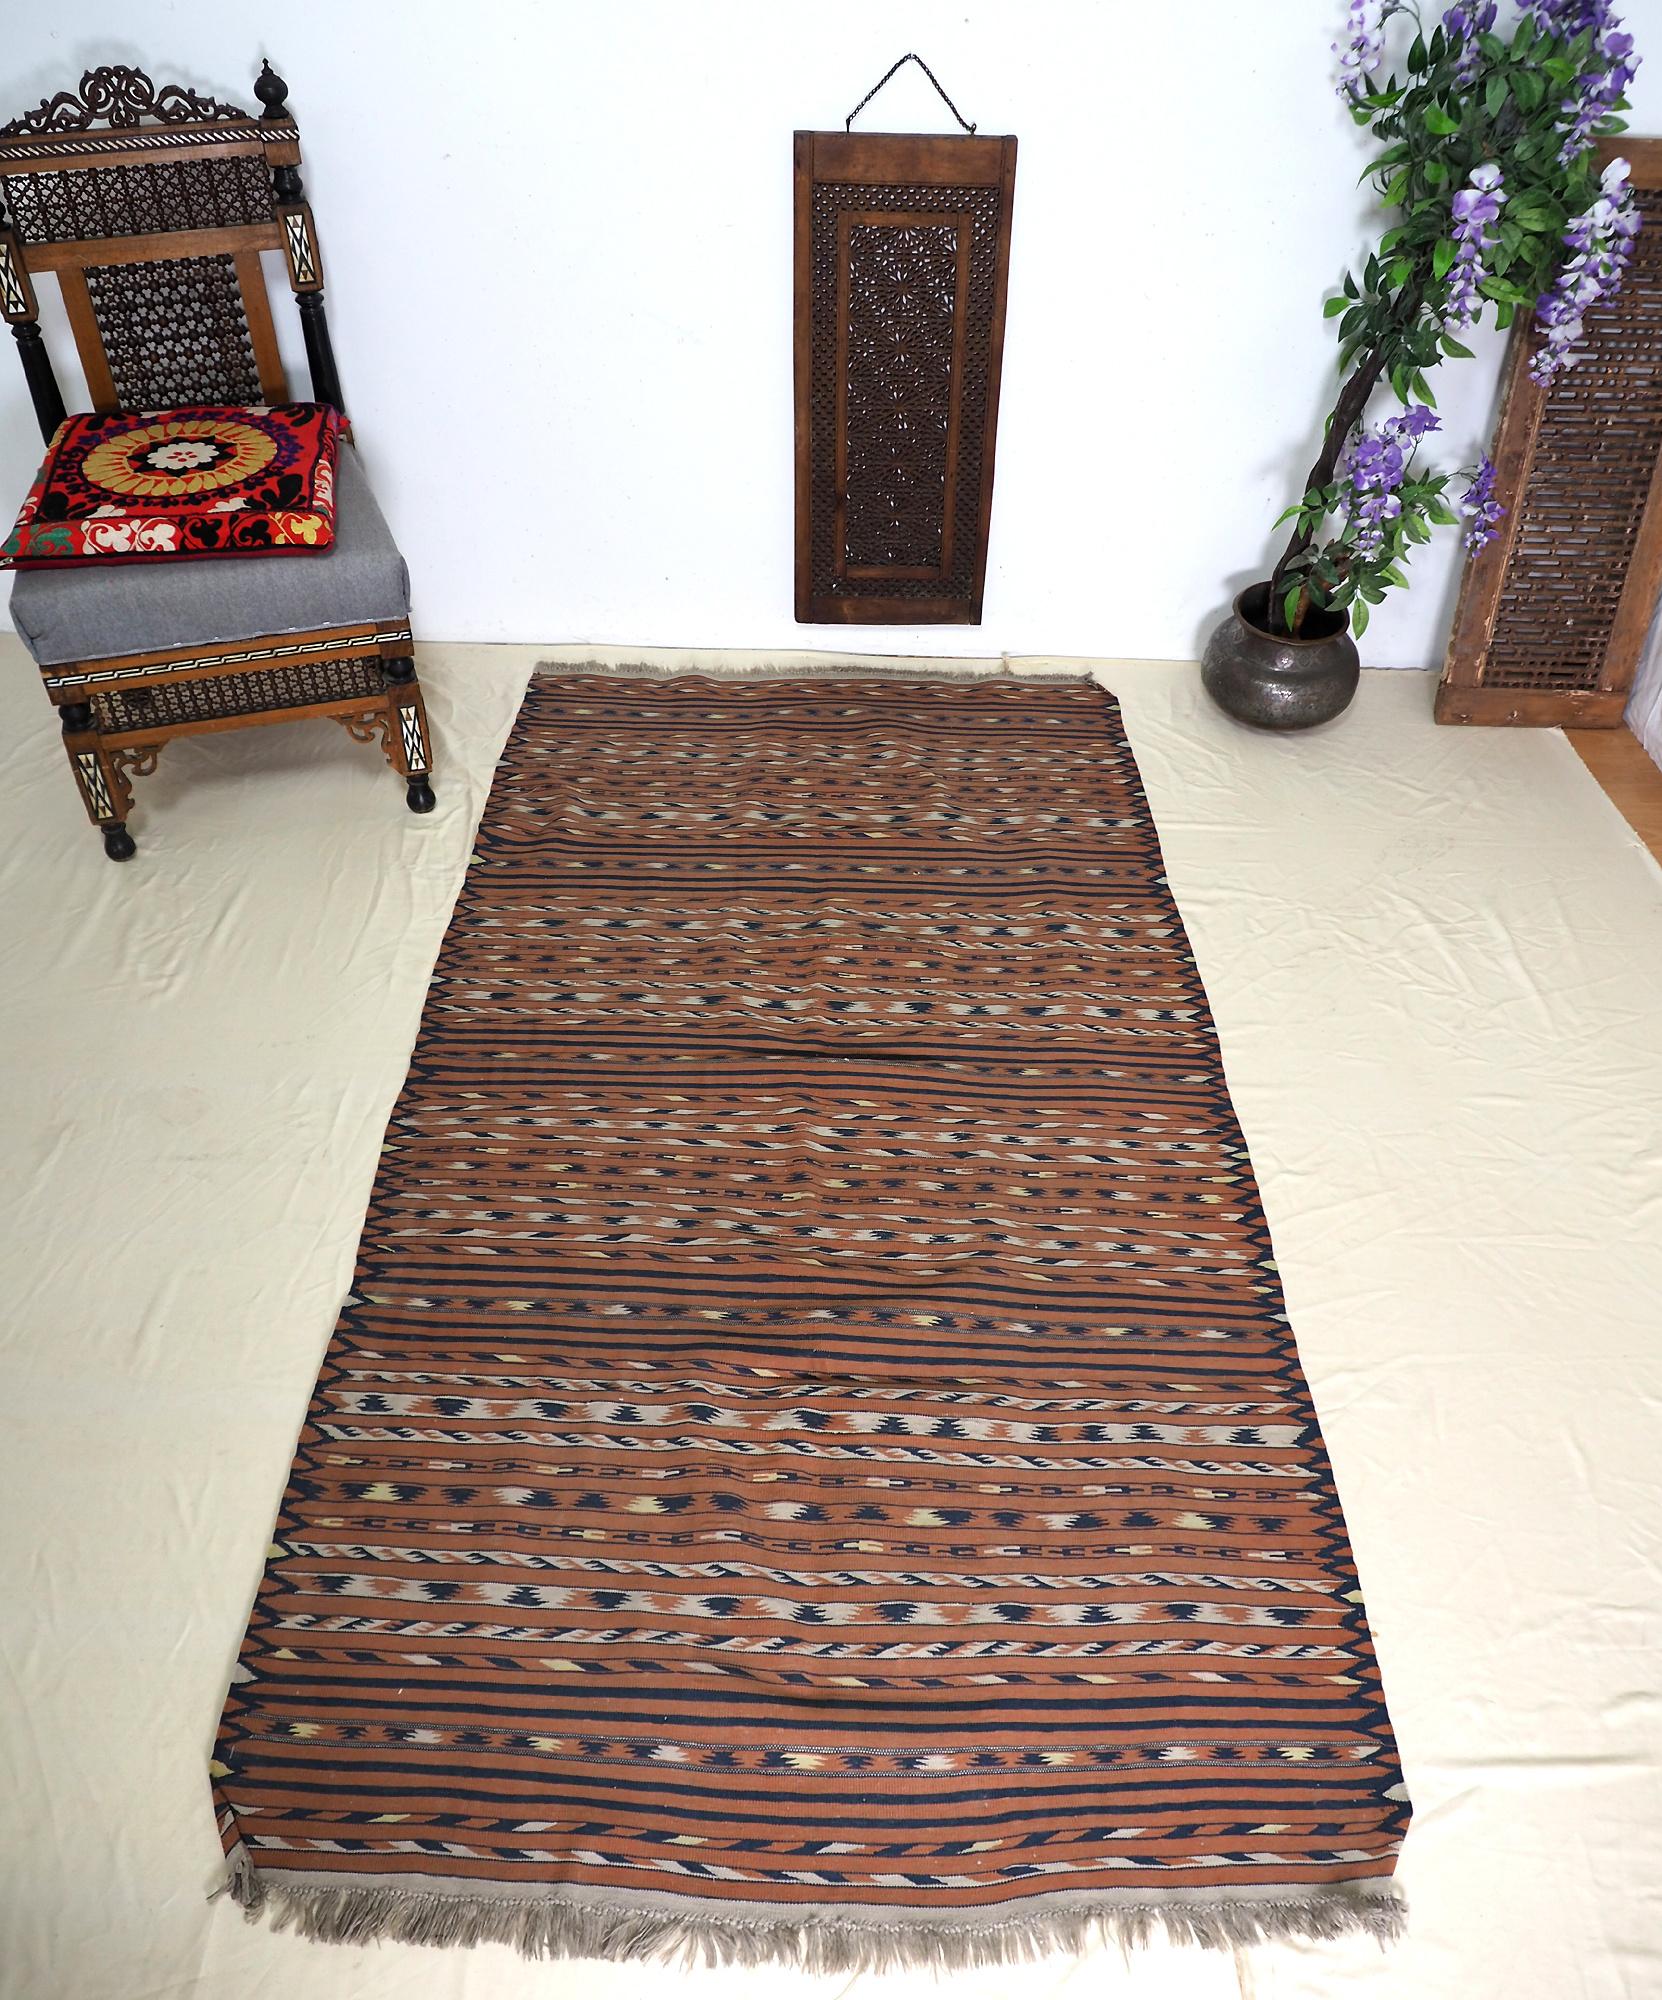 220x117 cm handgewebte orient Teppich Nomaden afghan kelim No:6